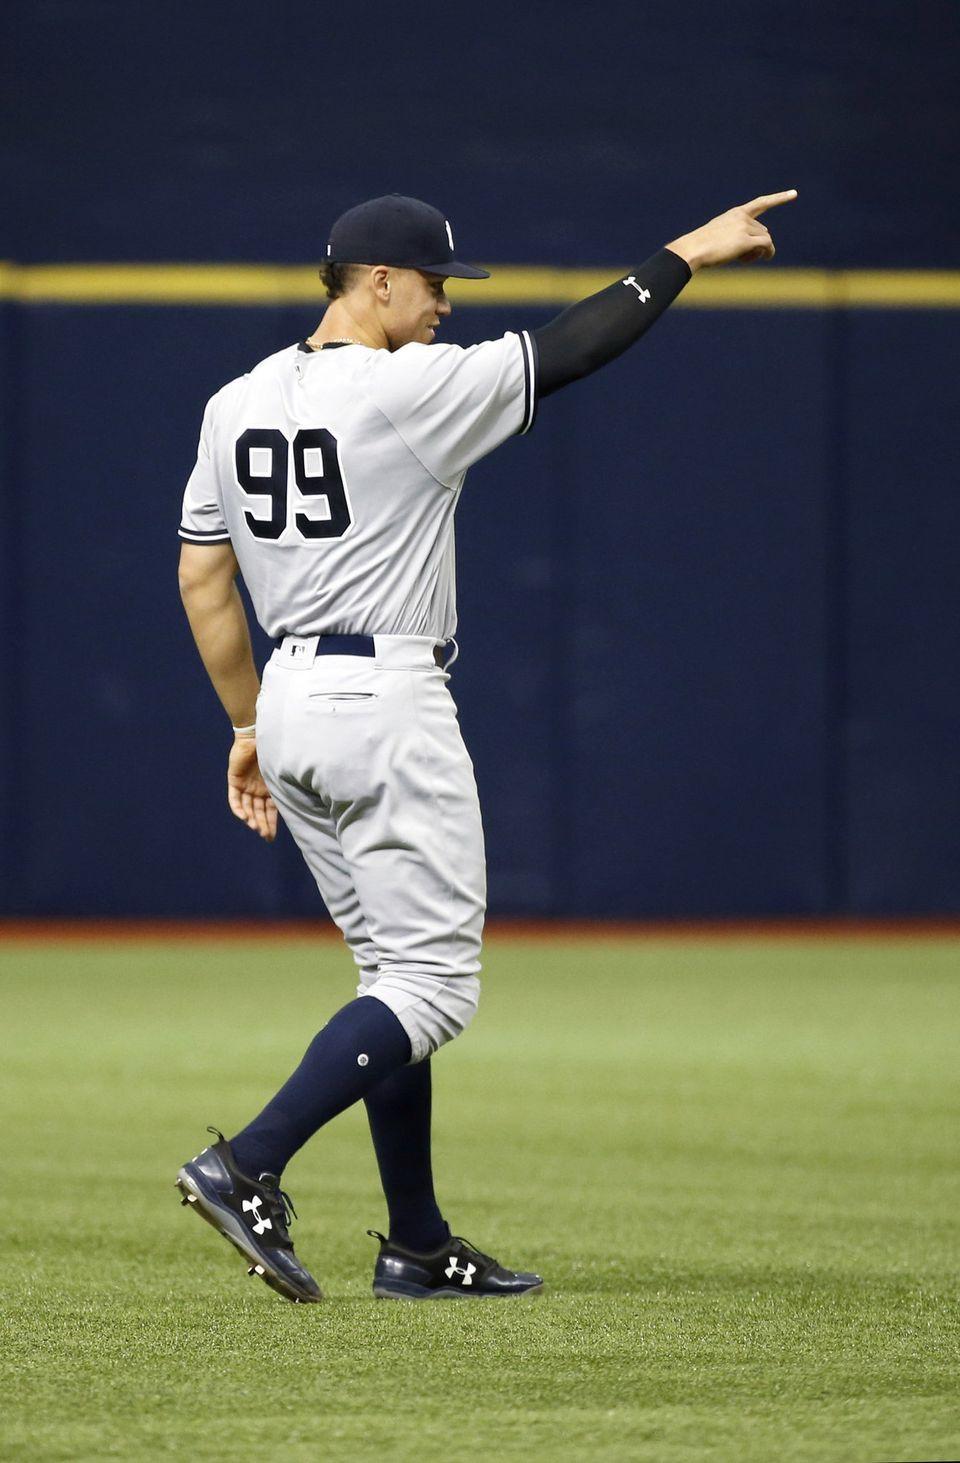 finest selection bf53a e4af4 How Yankees' Aaron Judge is like Derek Jeter to Joe Girardi ...